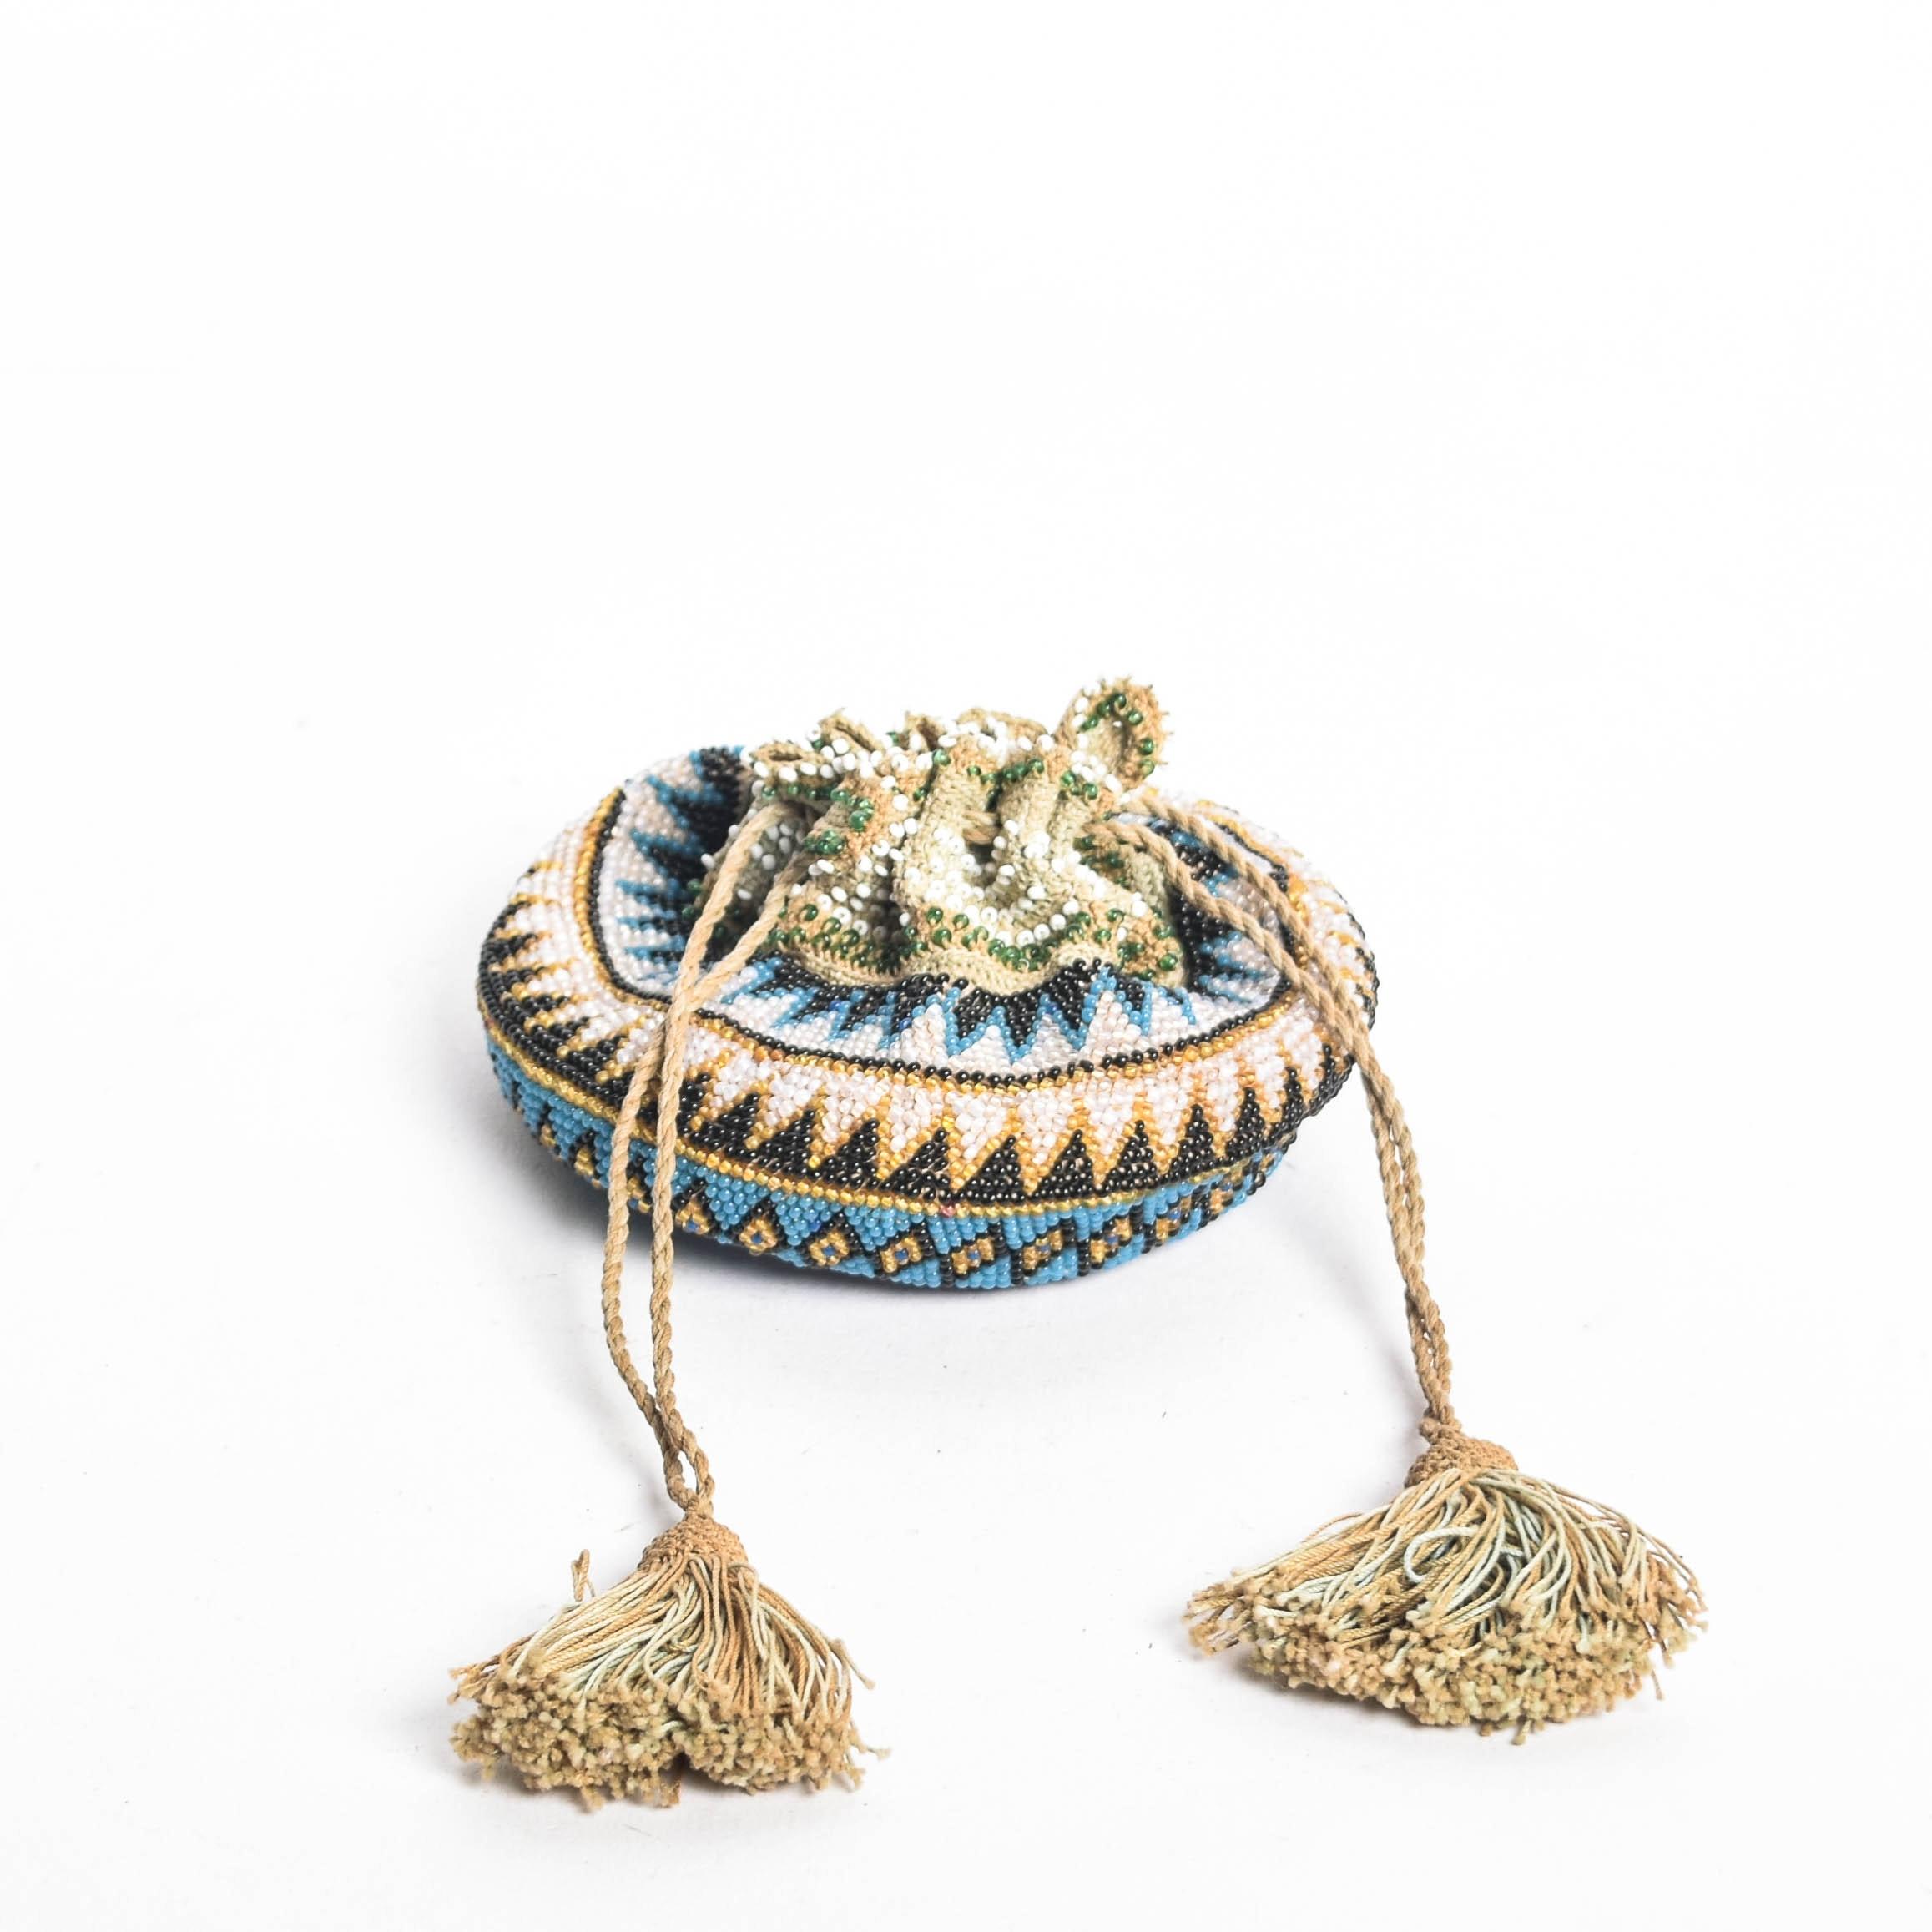 Antique Hand Beaded Drawstring Purse